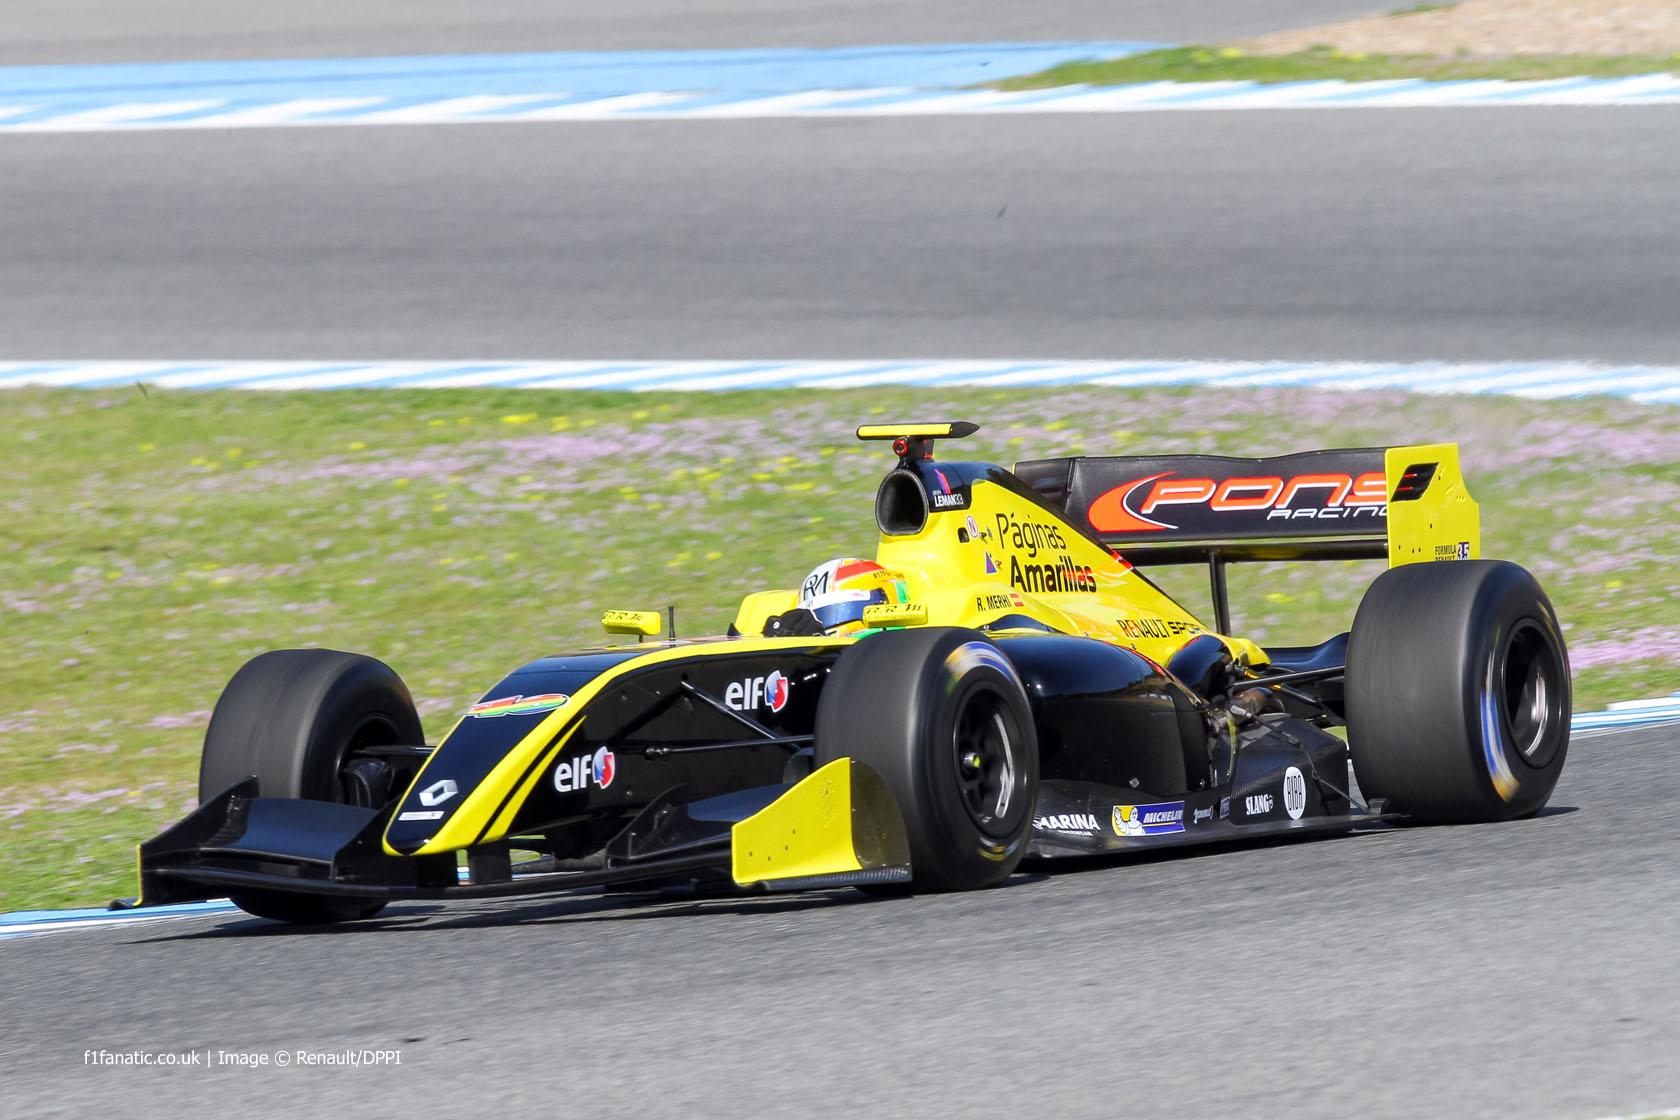 Roberto Merhi Formula Renault 3.5 Pons Jerez 2015